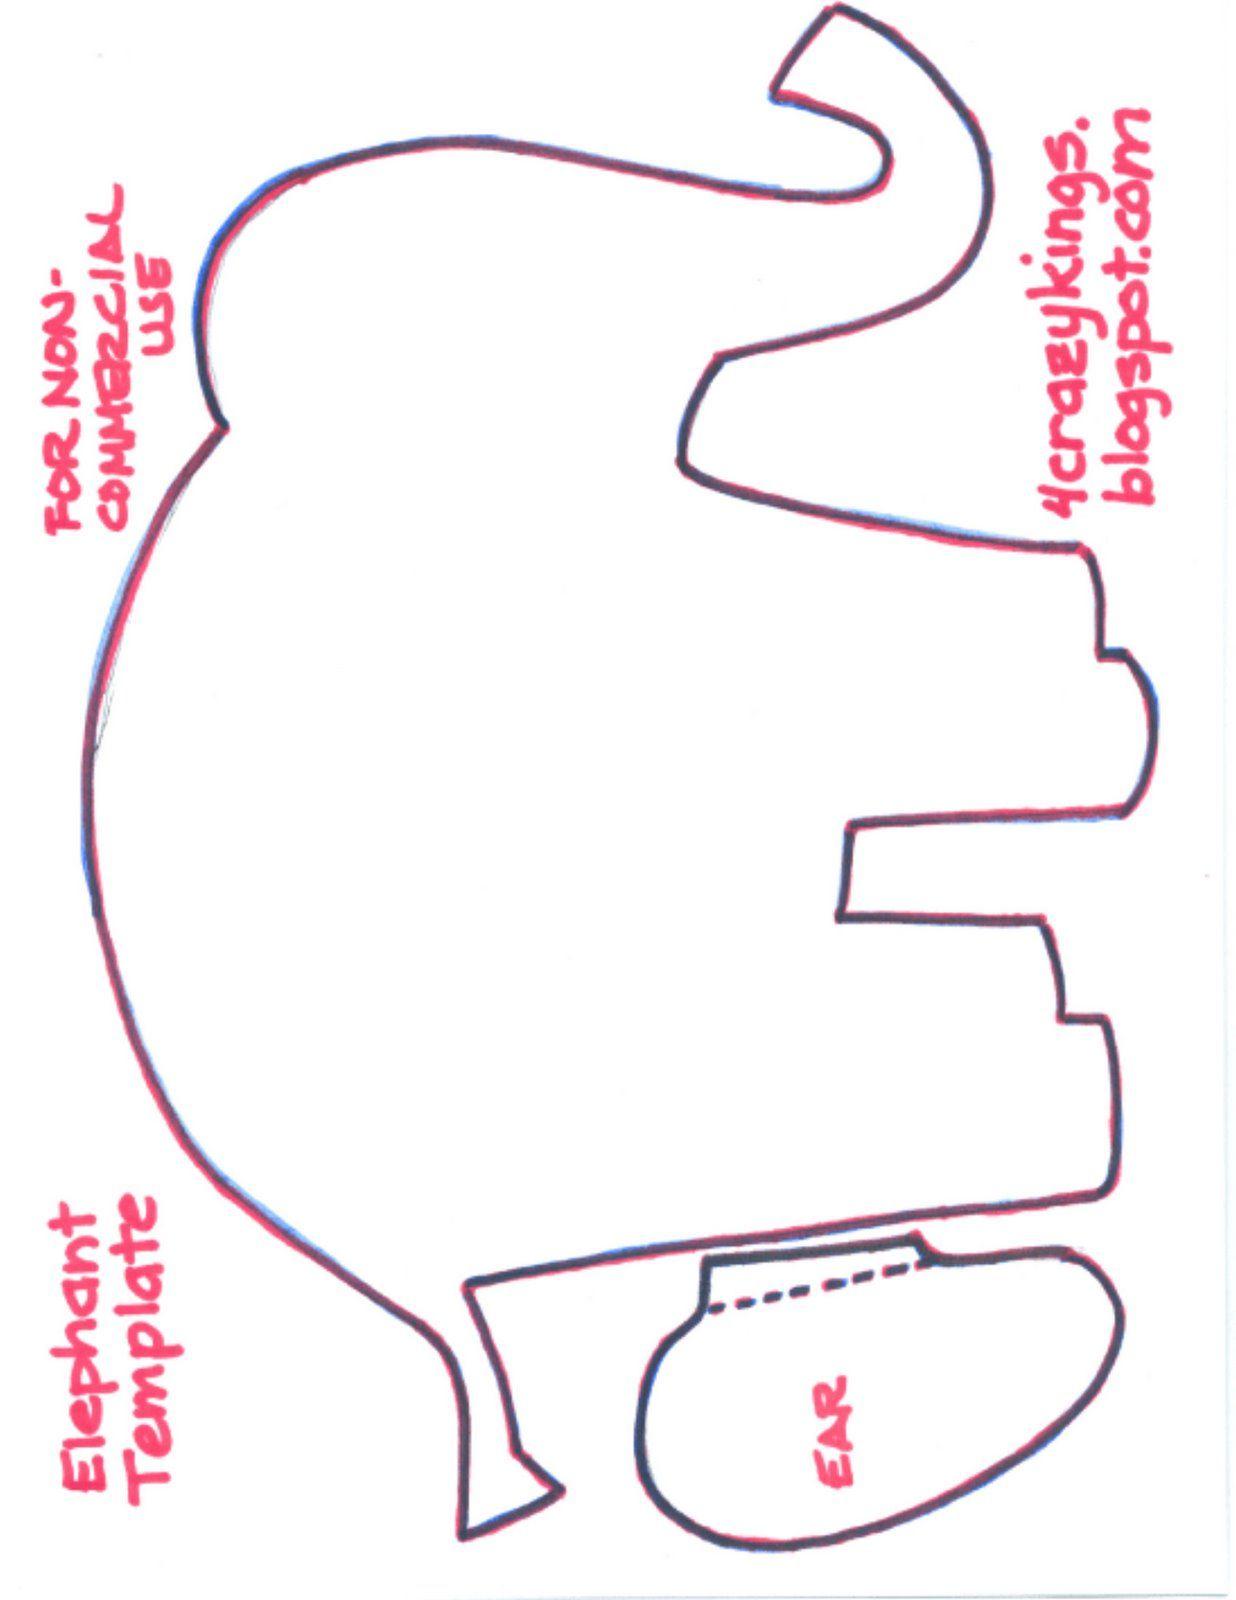 Elephant Template Fixed 1 236 1 600 Pixels